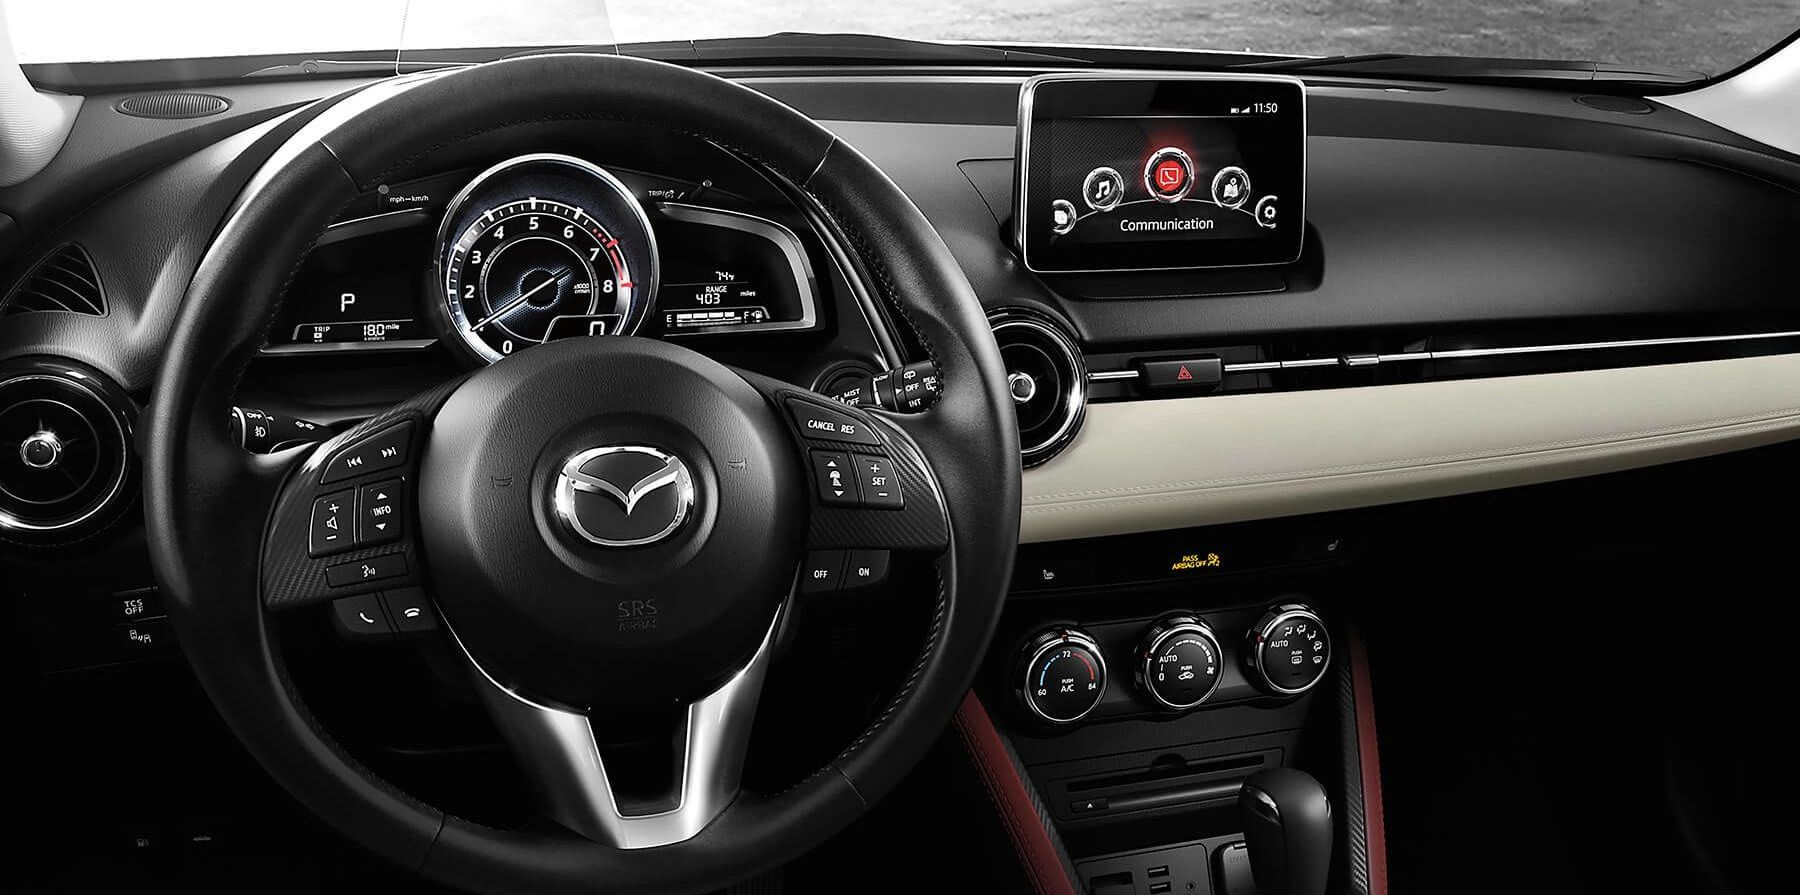 2017 Mazda CX-3 for Sale near League City, TX - Mazda of Clear Lake